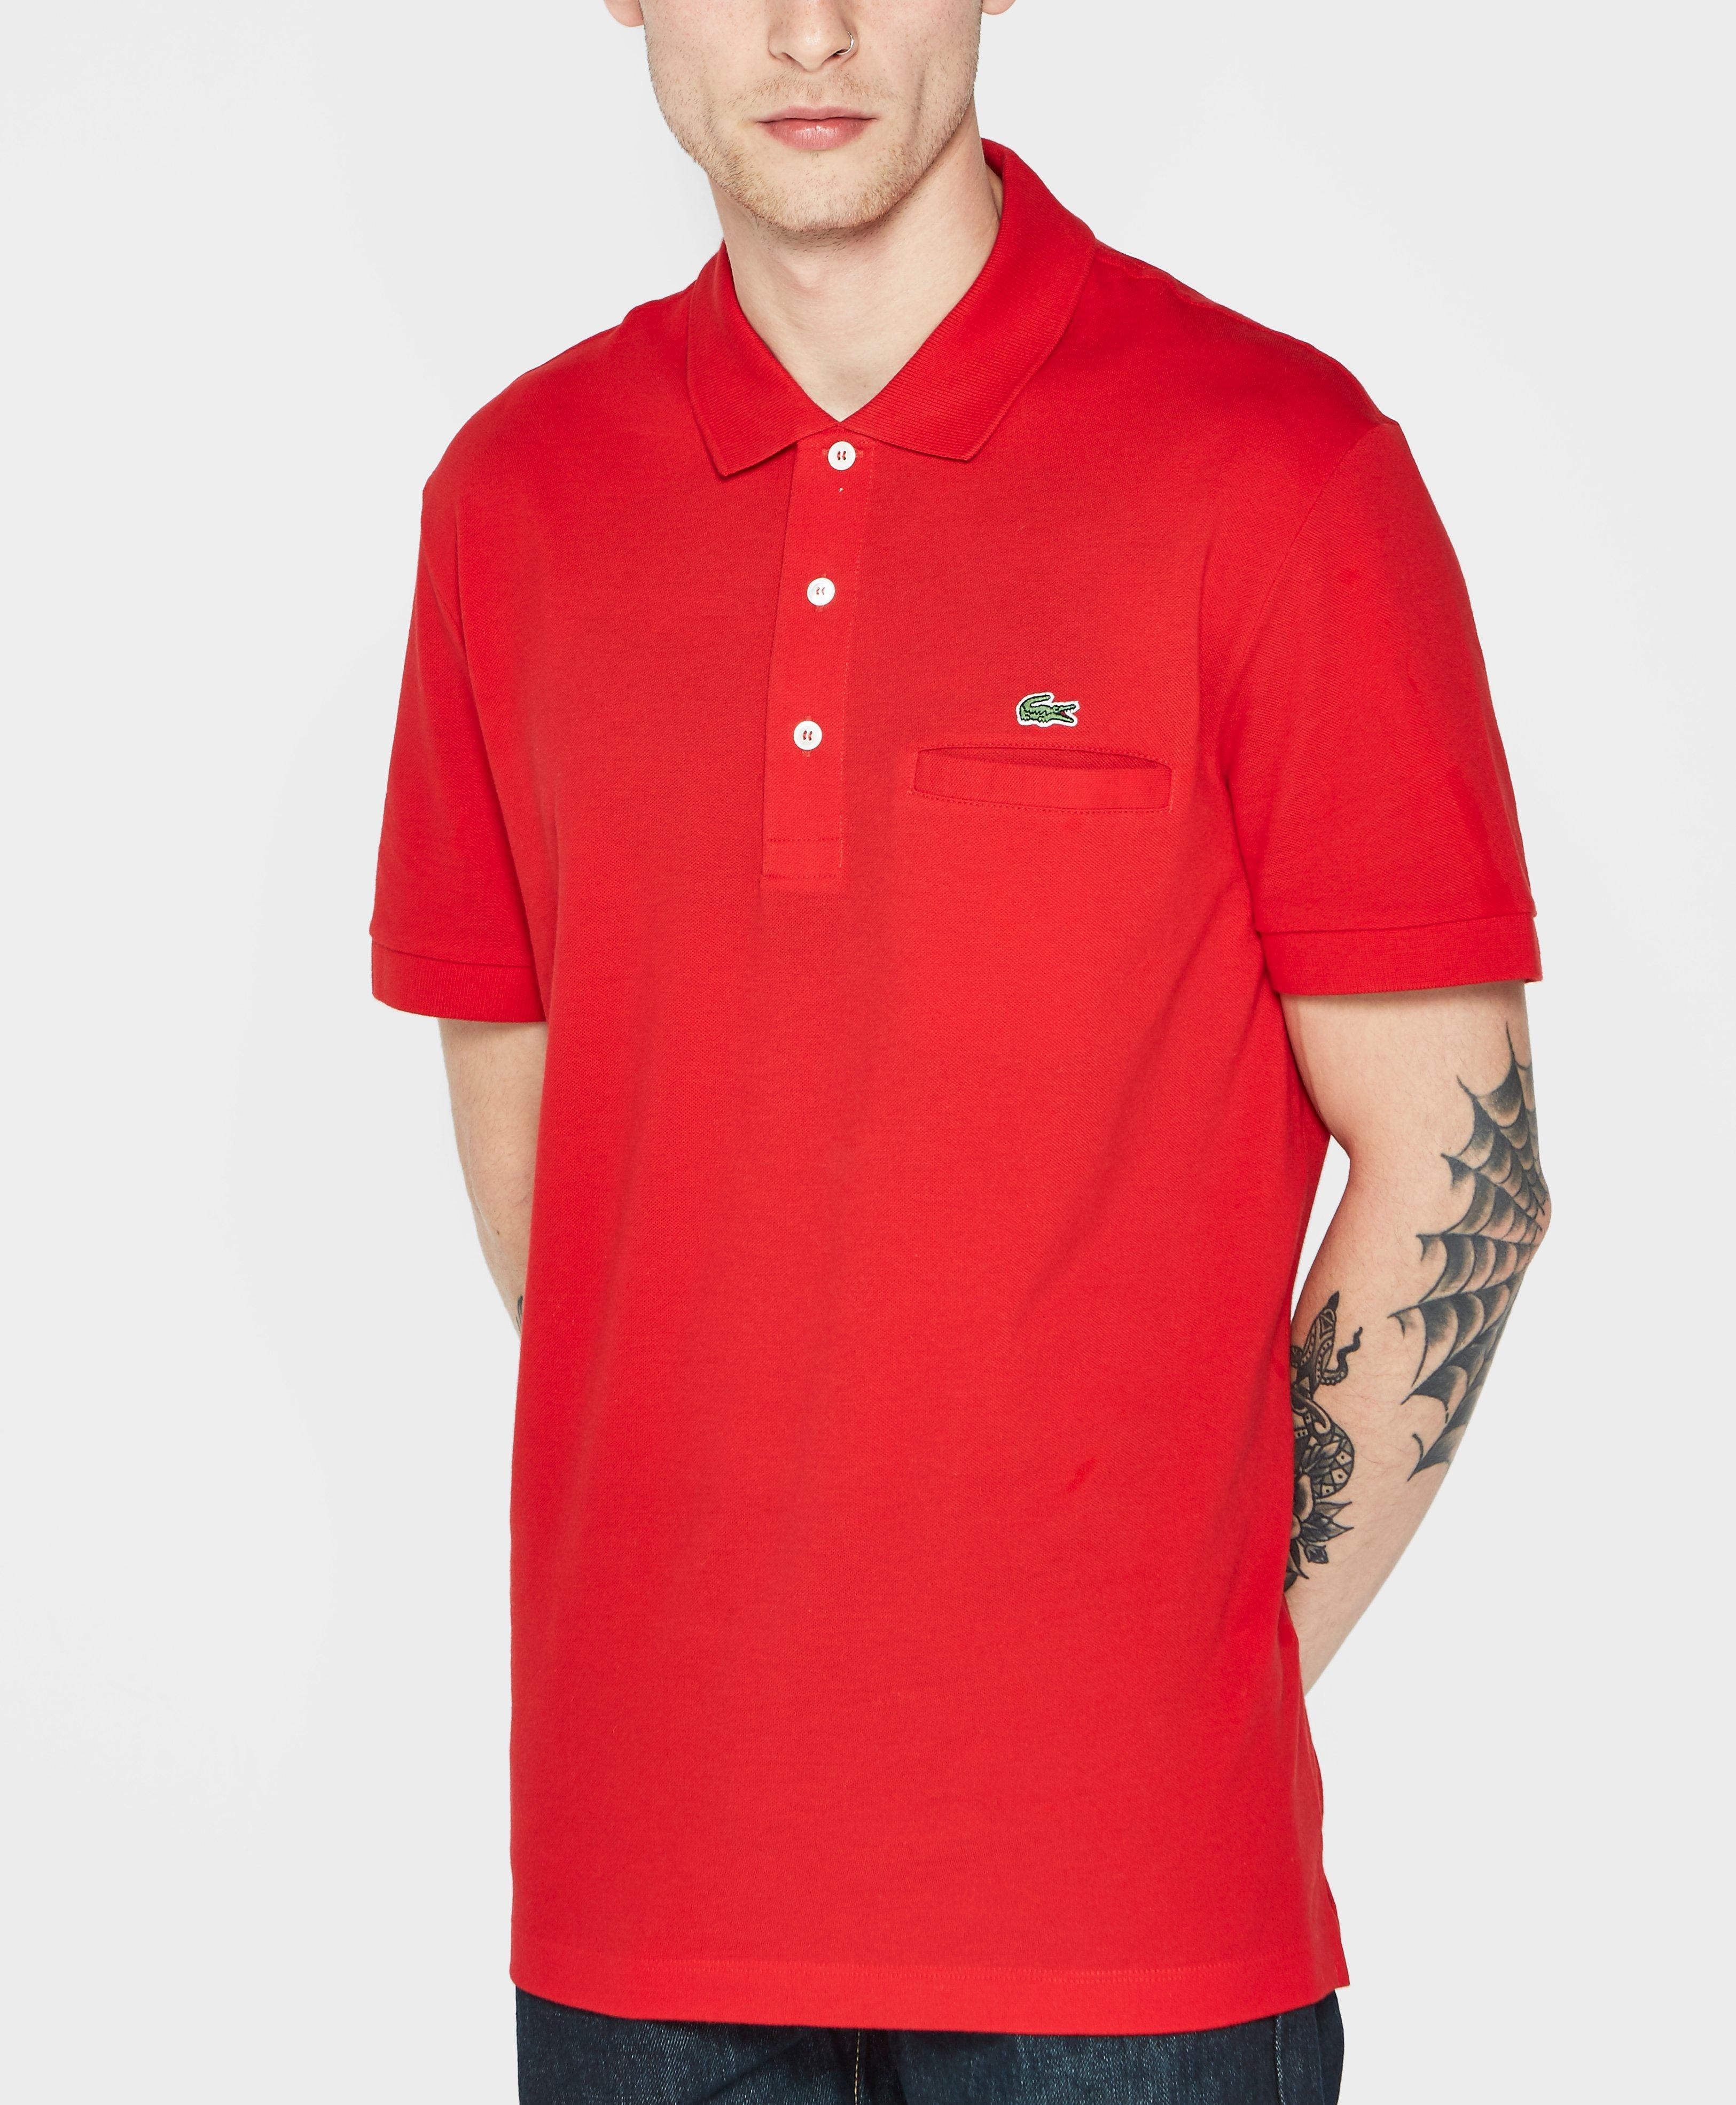 lacoste pocket pique polo shirt in red for men lyst. Black Bedroom Furniture Sets. Home Design Ideas